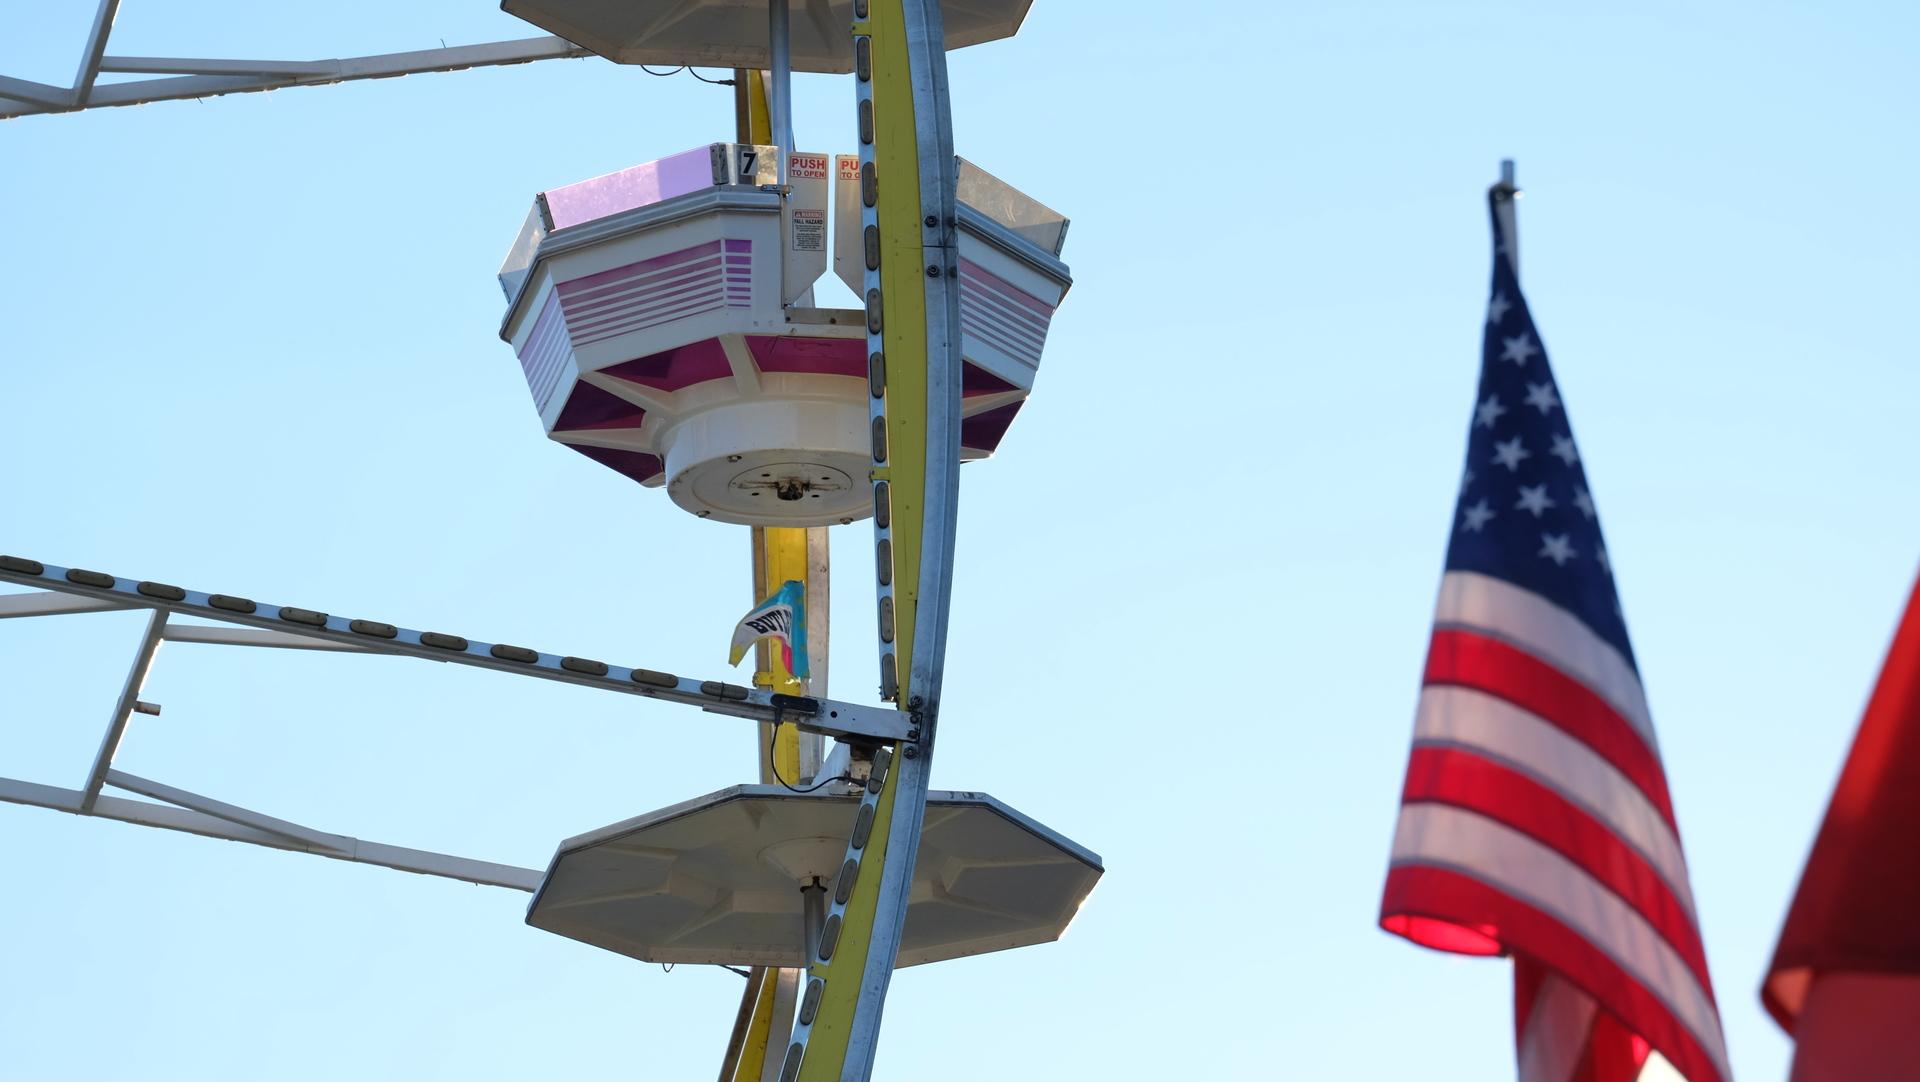 Ferris wheel bucket   tschat, ferris wheel, American, flag